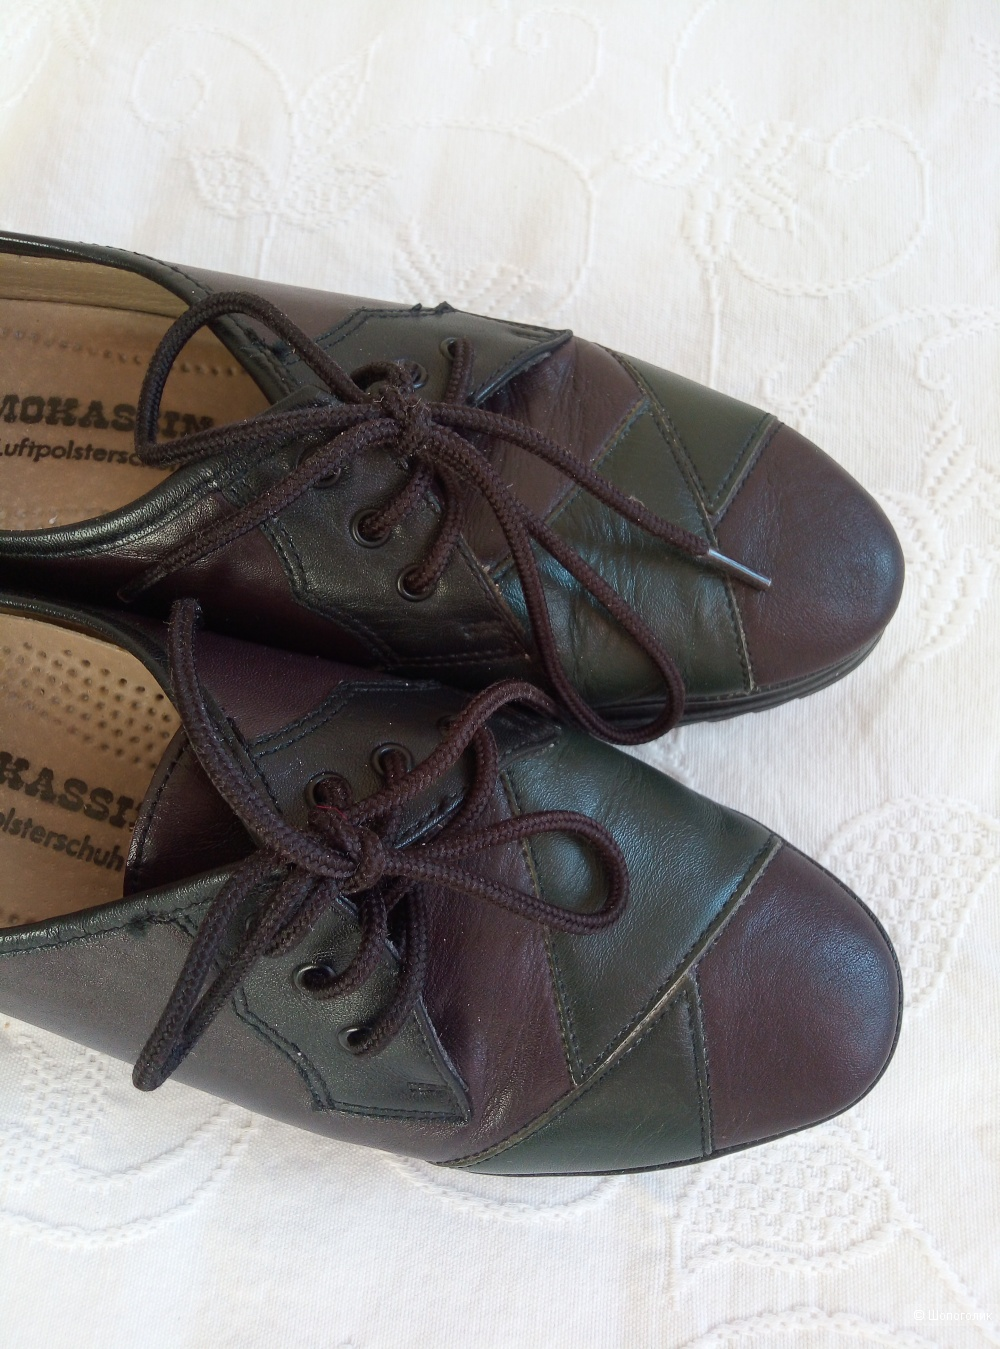 Женские туфли- Mokassin Jenny (Luftpolster) 39 размер